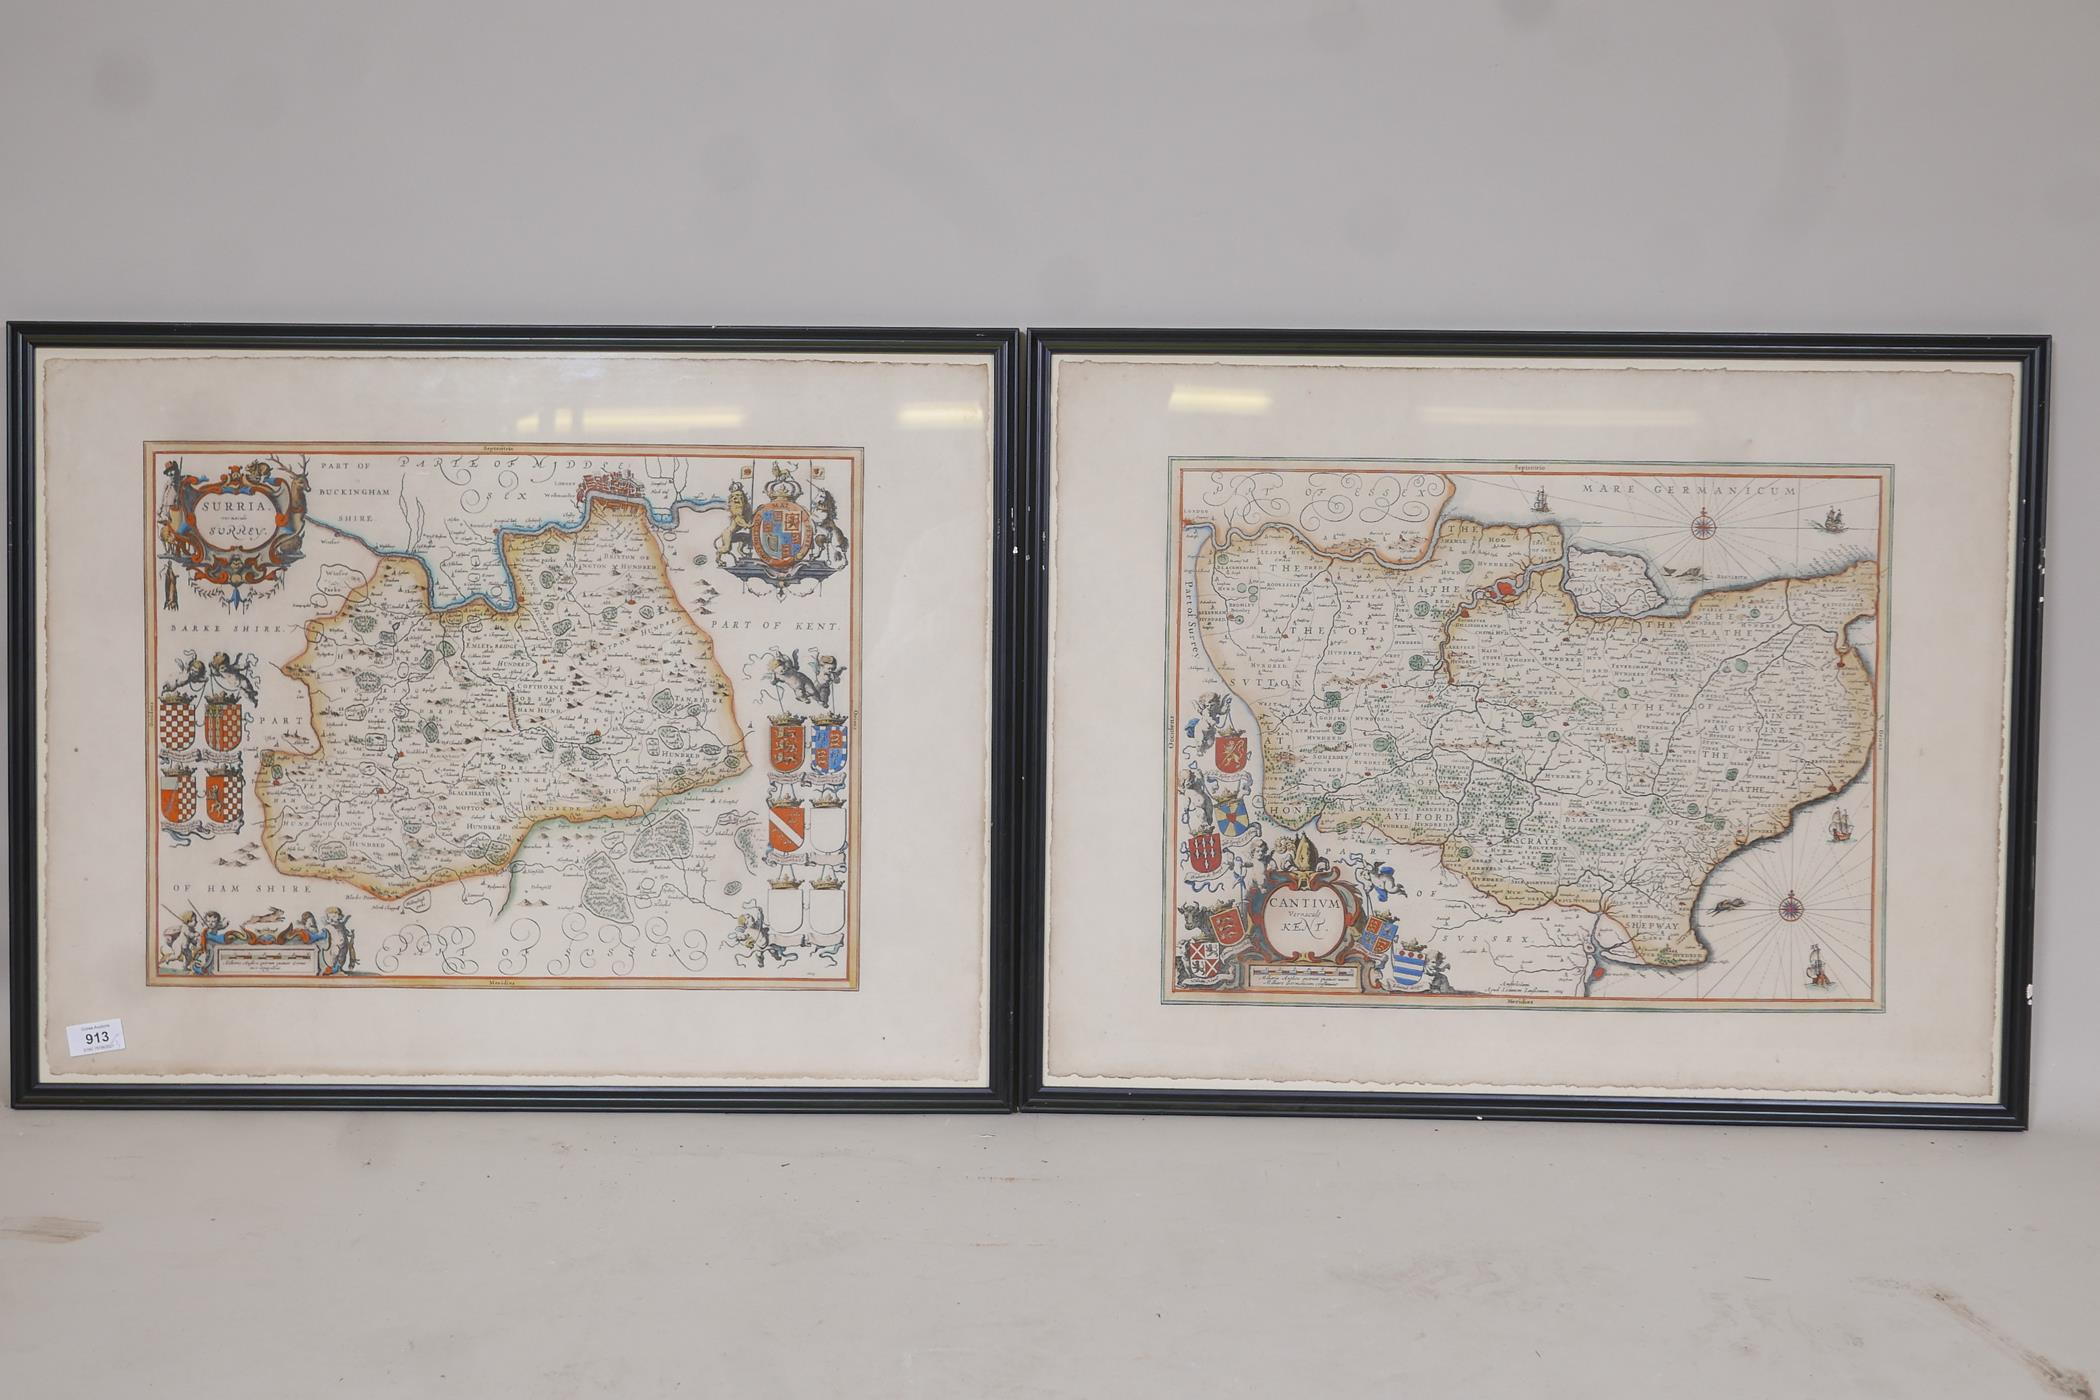 Map of Kent, Cantium vernacule Kent, and another of Surrey, Surria vernacule Surrey, both hand